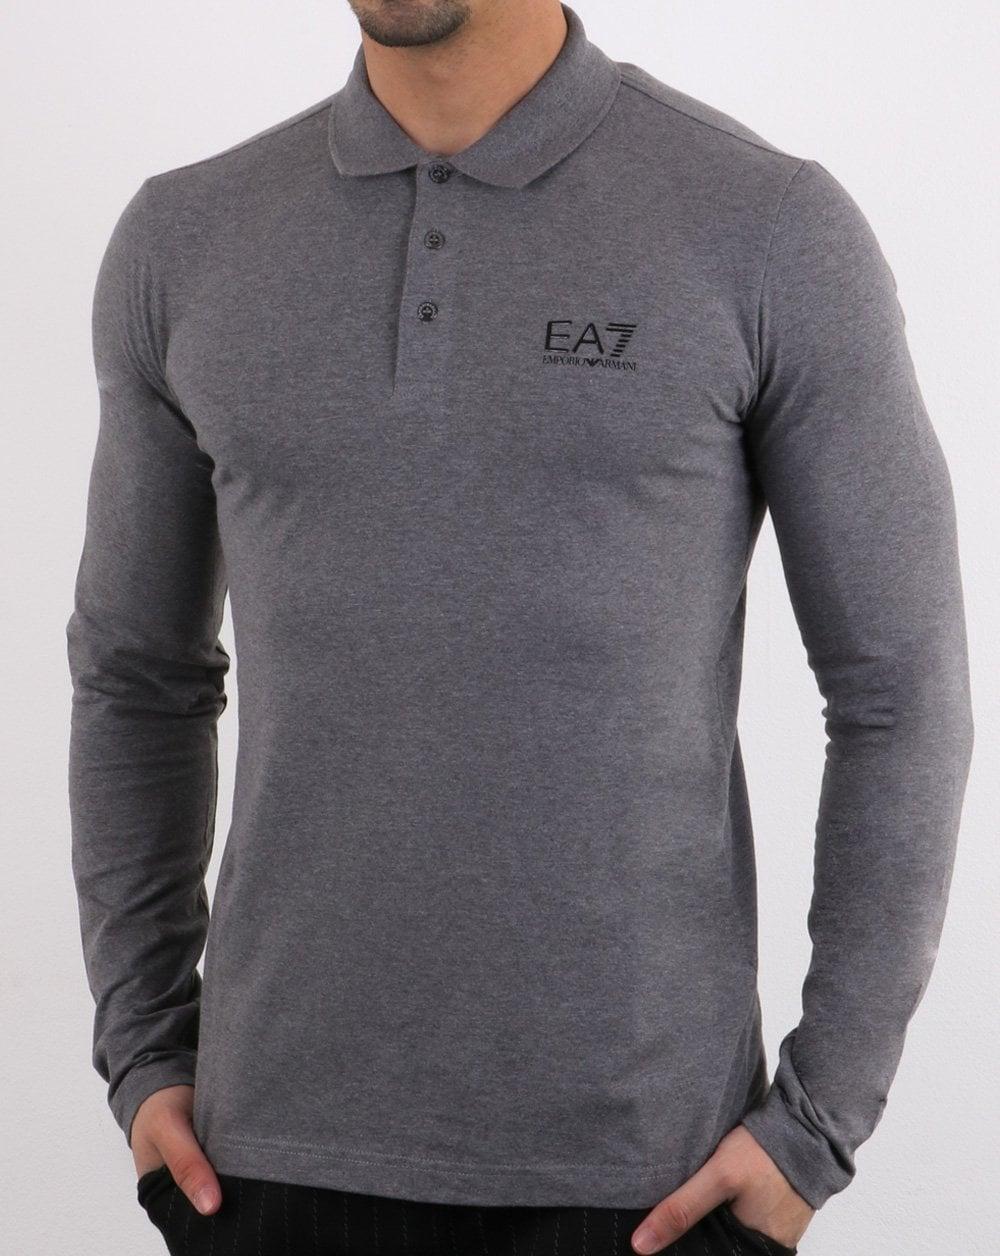 9f7d9d3b Emporio Armani EA7 Long Sleeve Polo Shirt Dark Grey